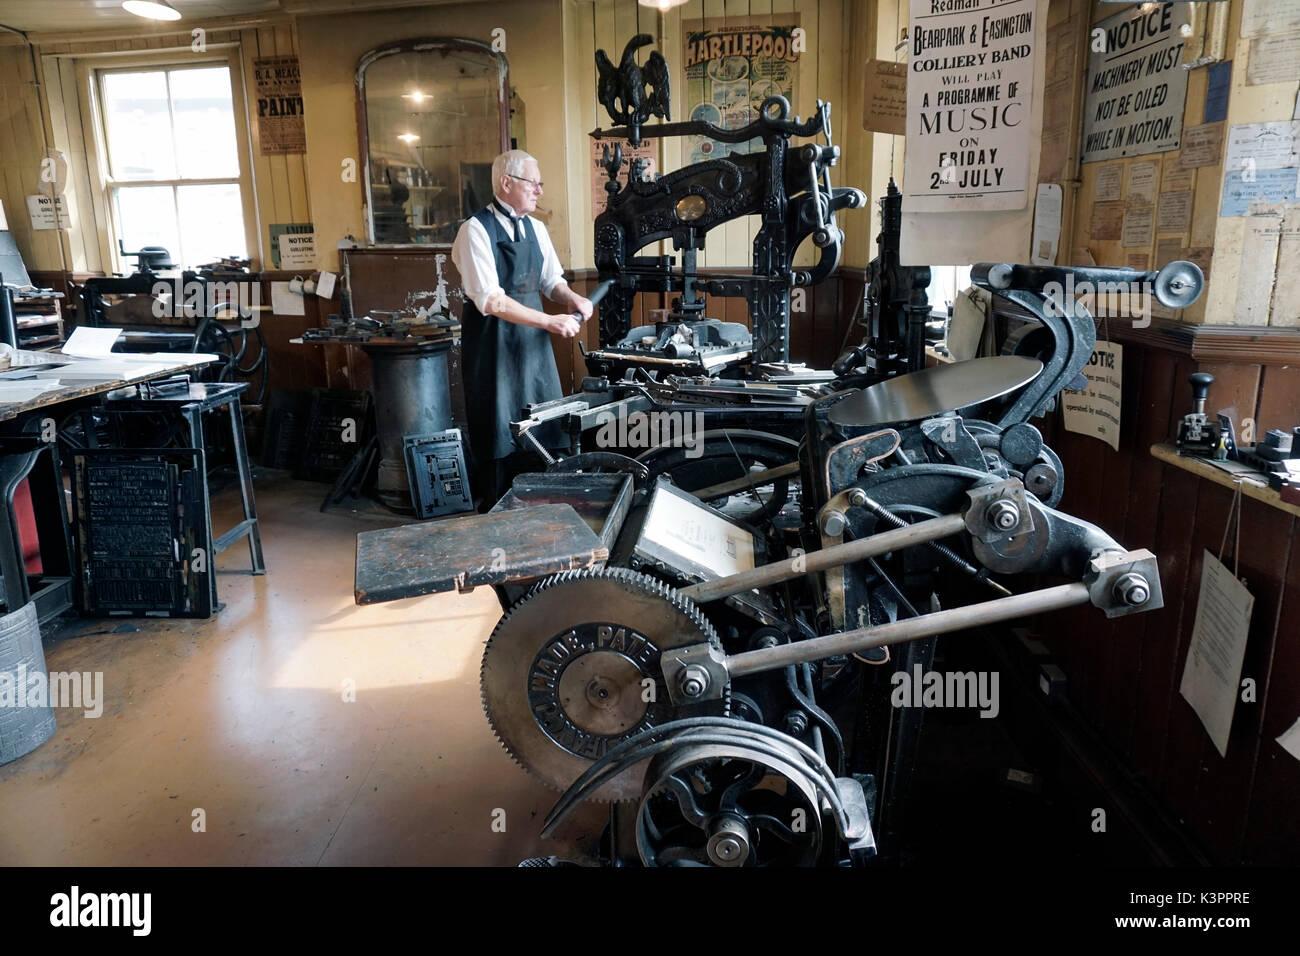 older male printer working vintage flatbed printing press surrounded by vintage printing platen press - Stock Image